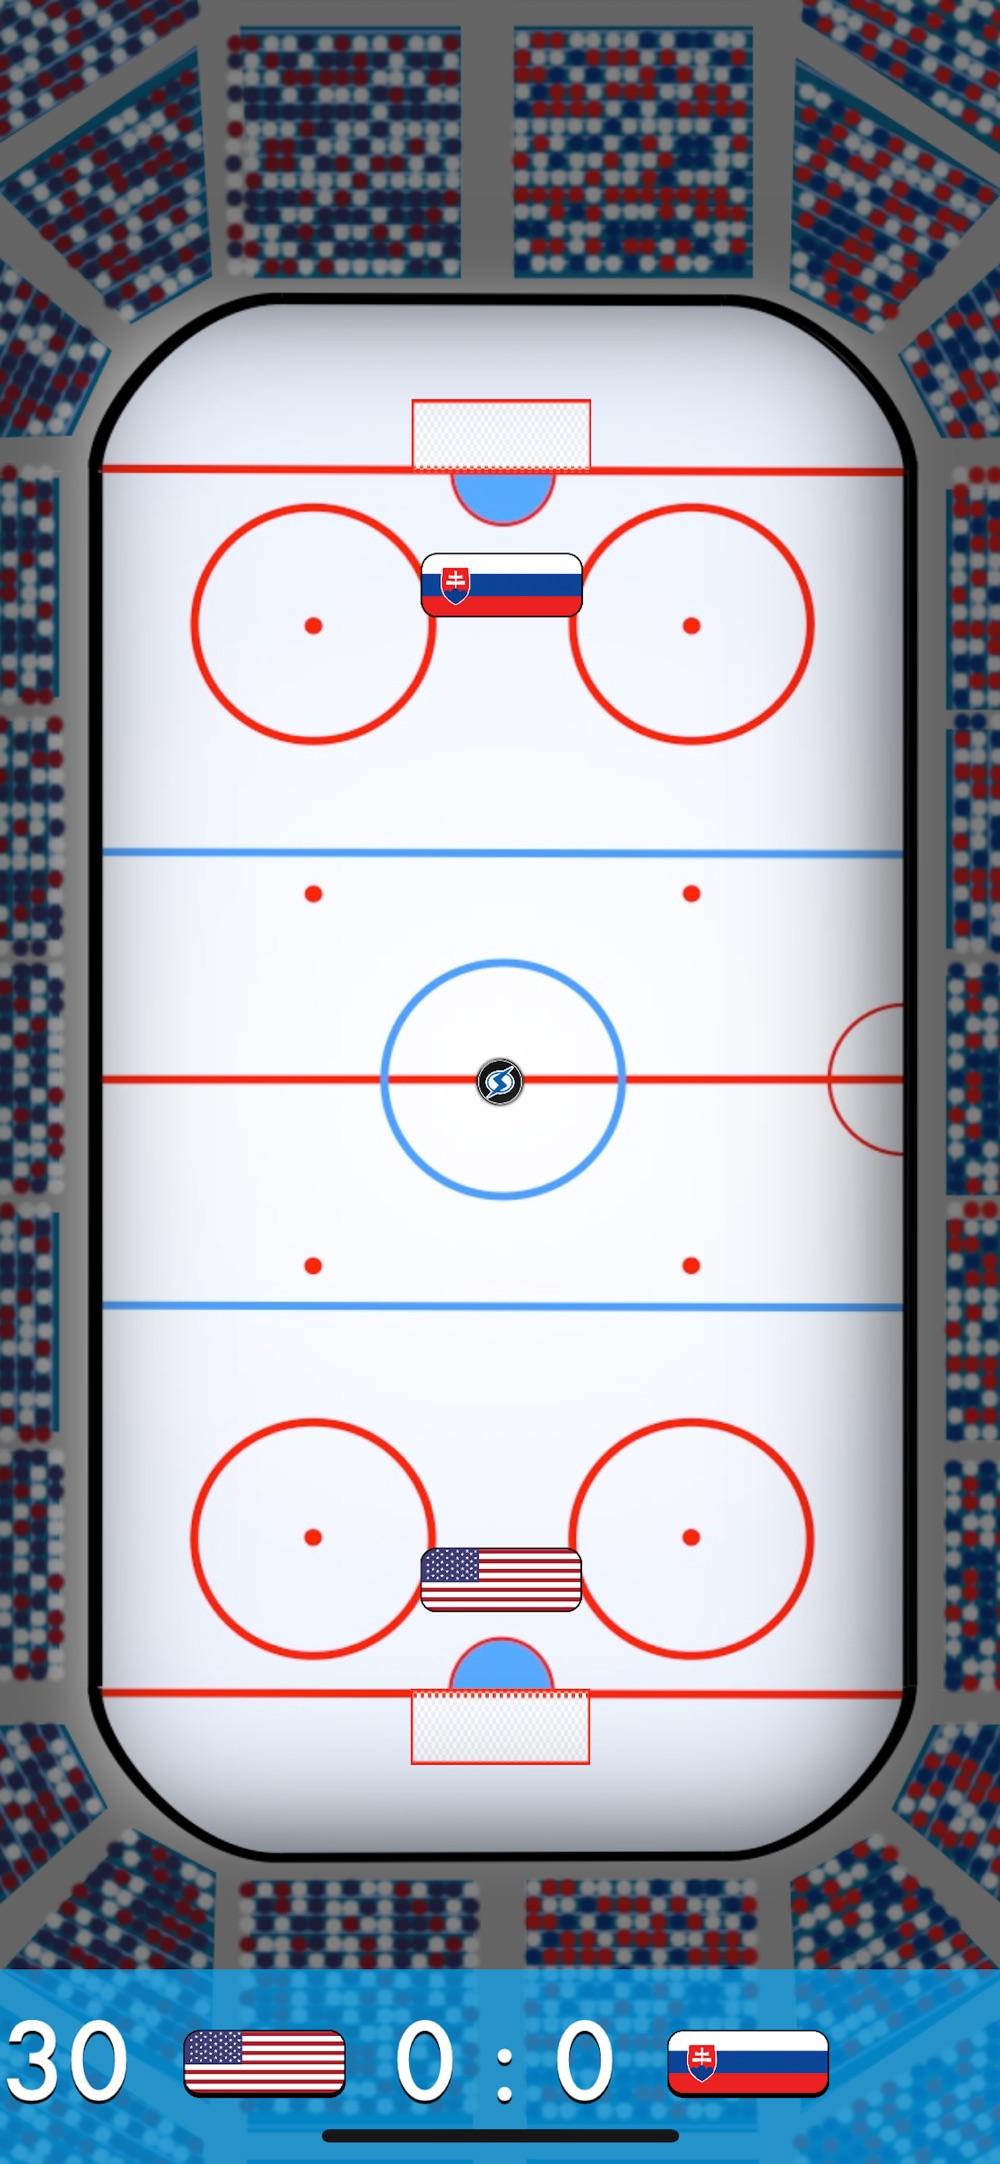 Hockey Blitz Cheat Codes